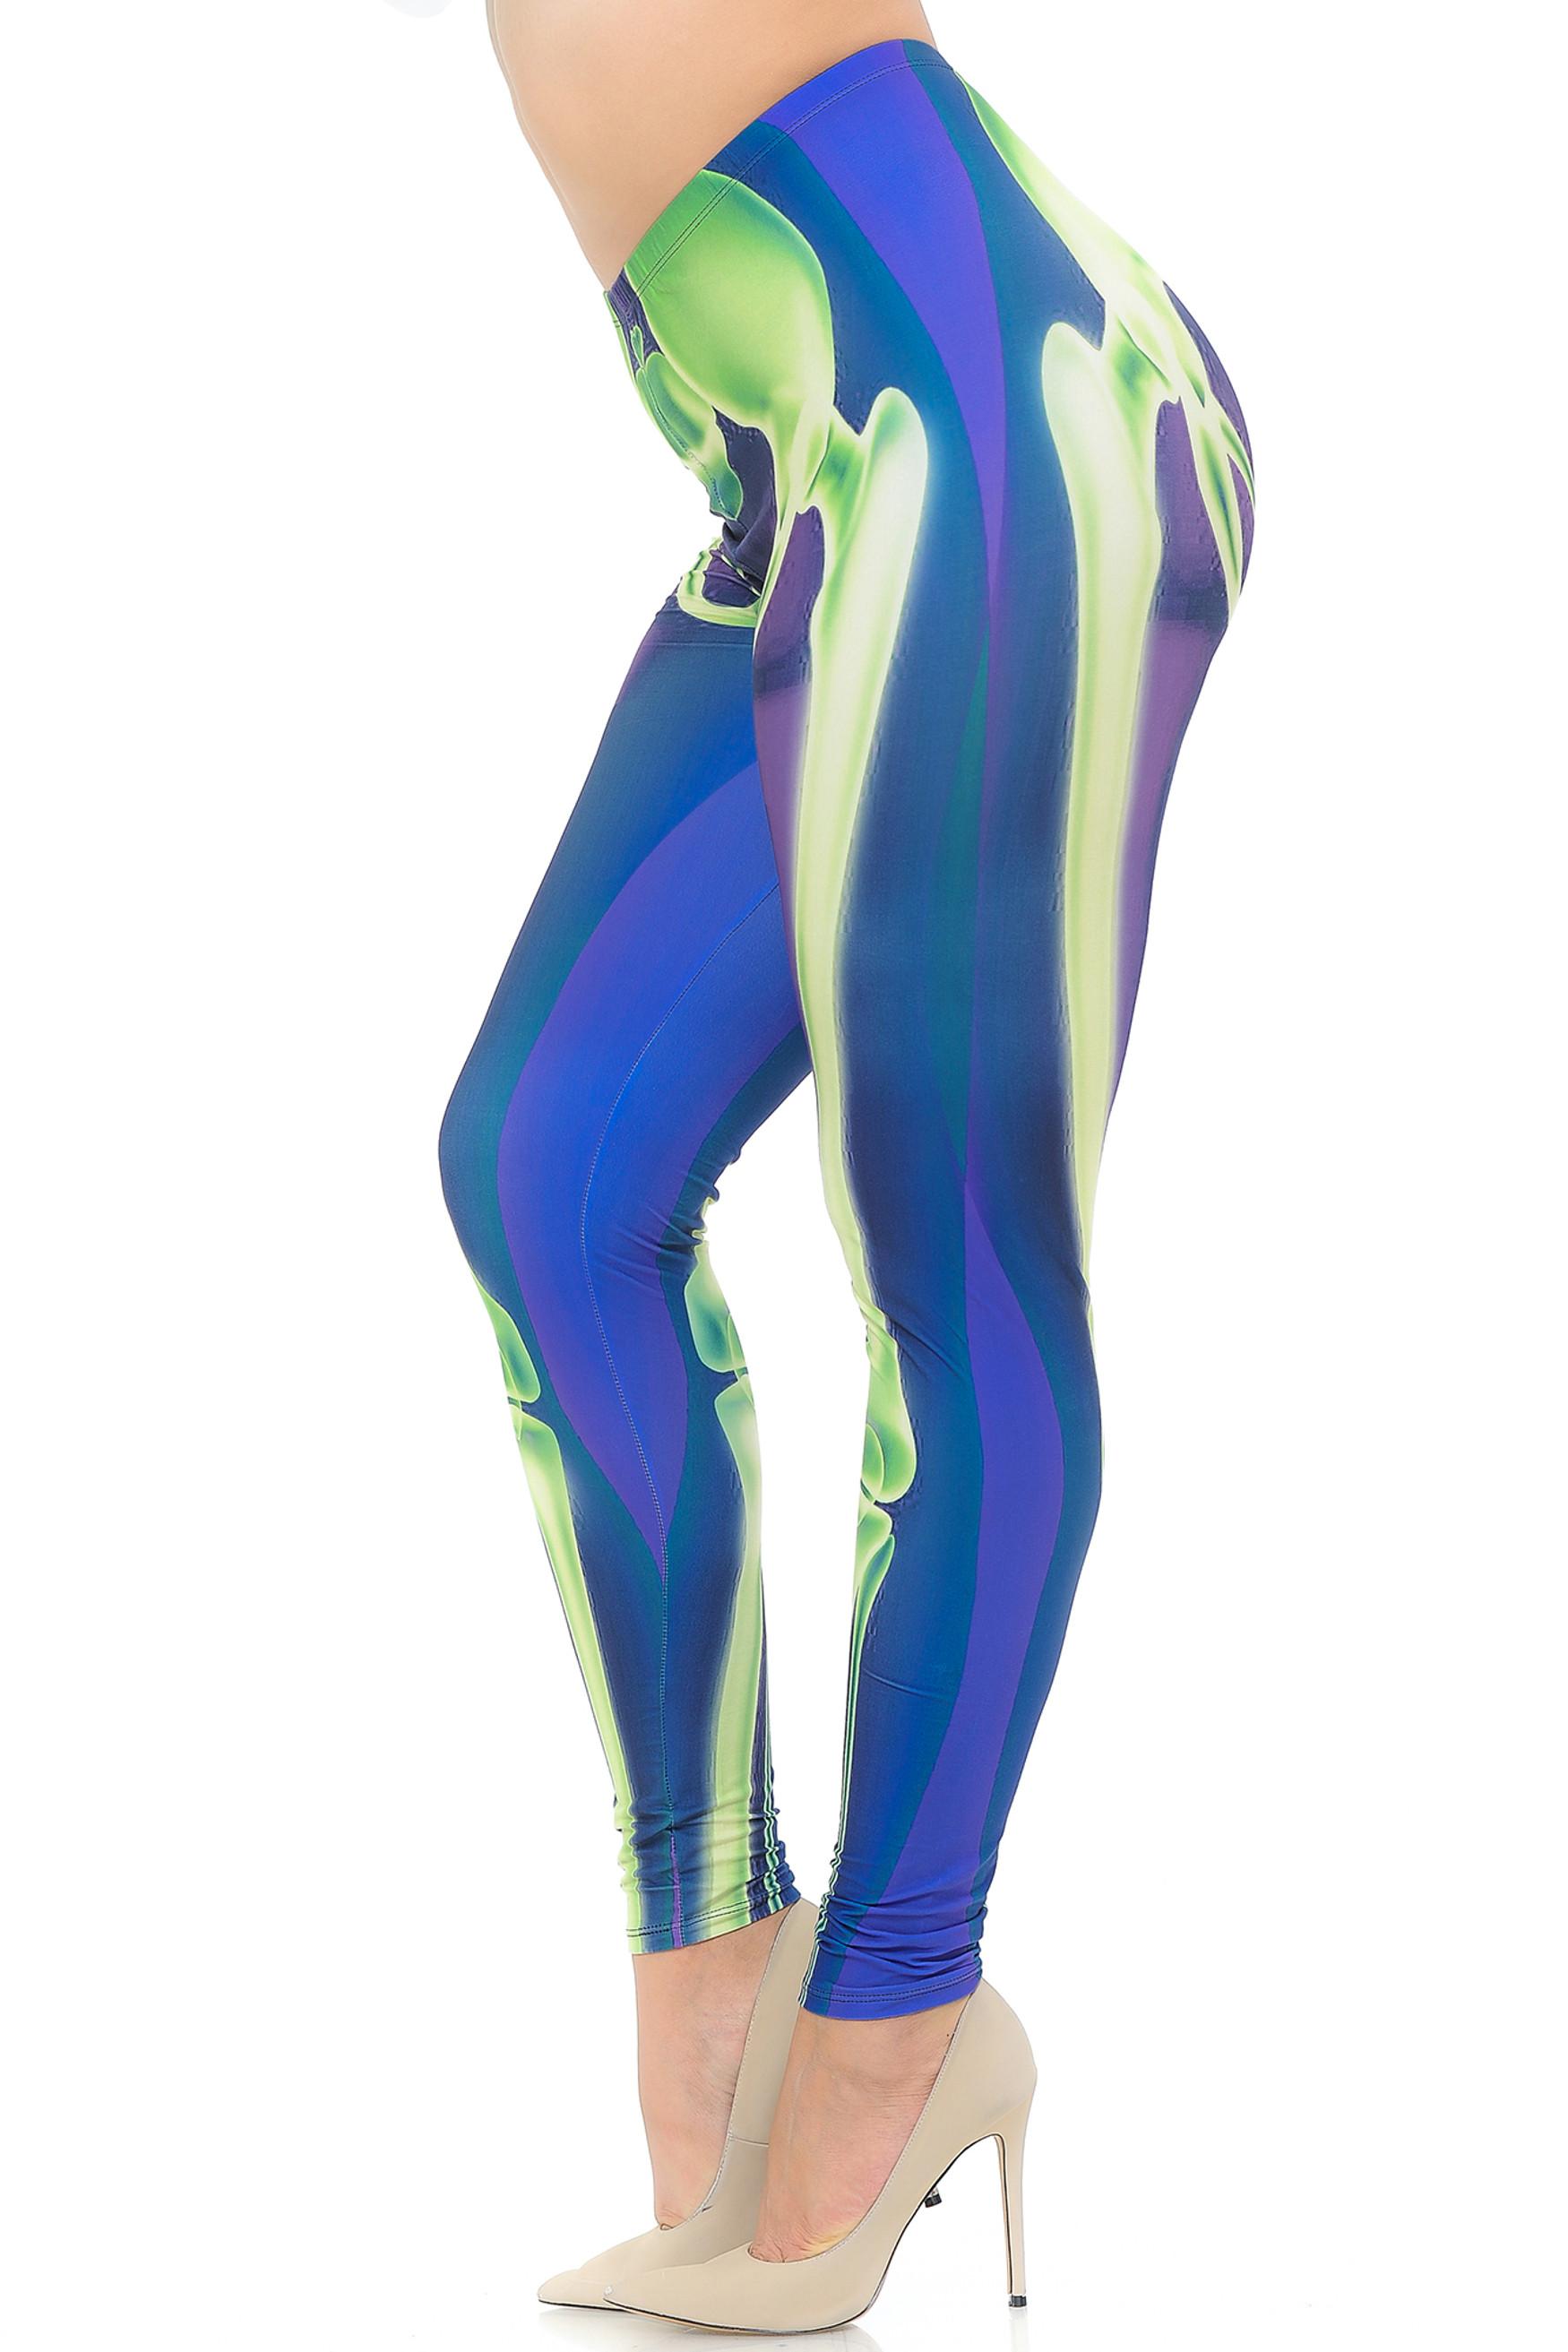 Creamy Soft Chernobyl Skeleton Bones Extra Plus Size Leggings - 3X-5X - USA Fashion™